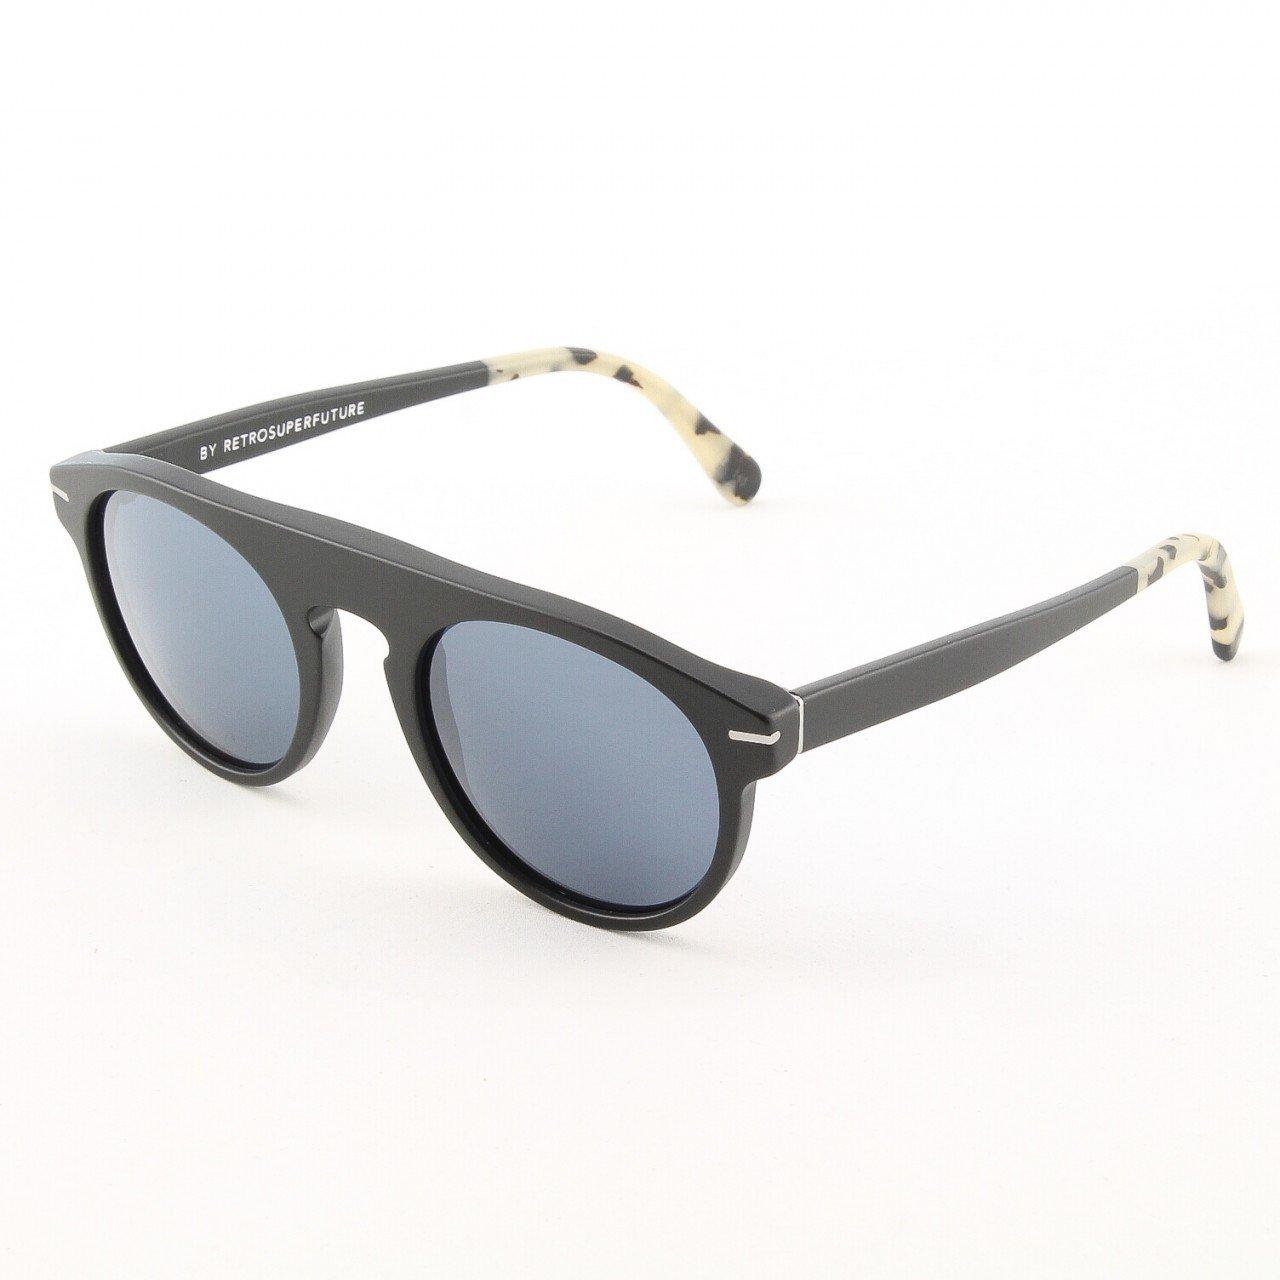 Super Racer 908/3T Sunglasses Color Puma Black Marble Pattern by RETROSUPERFUTURE